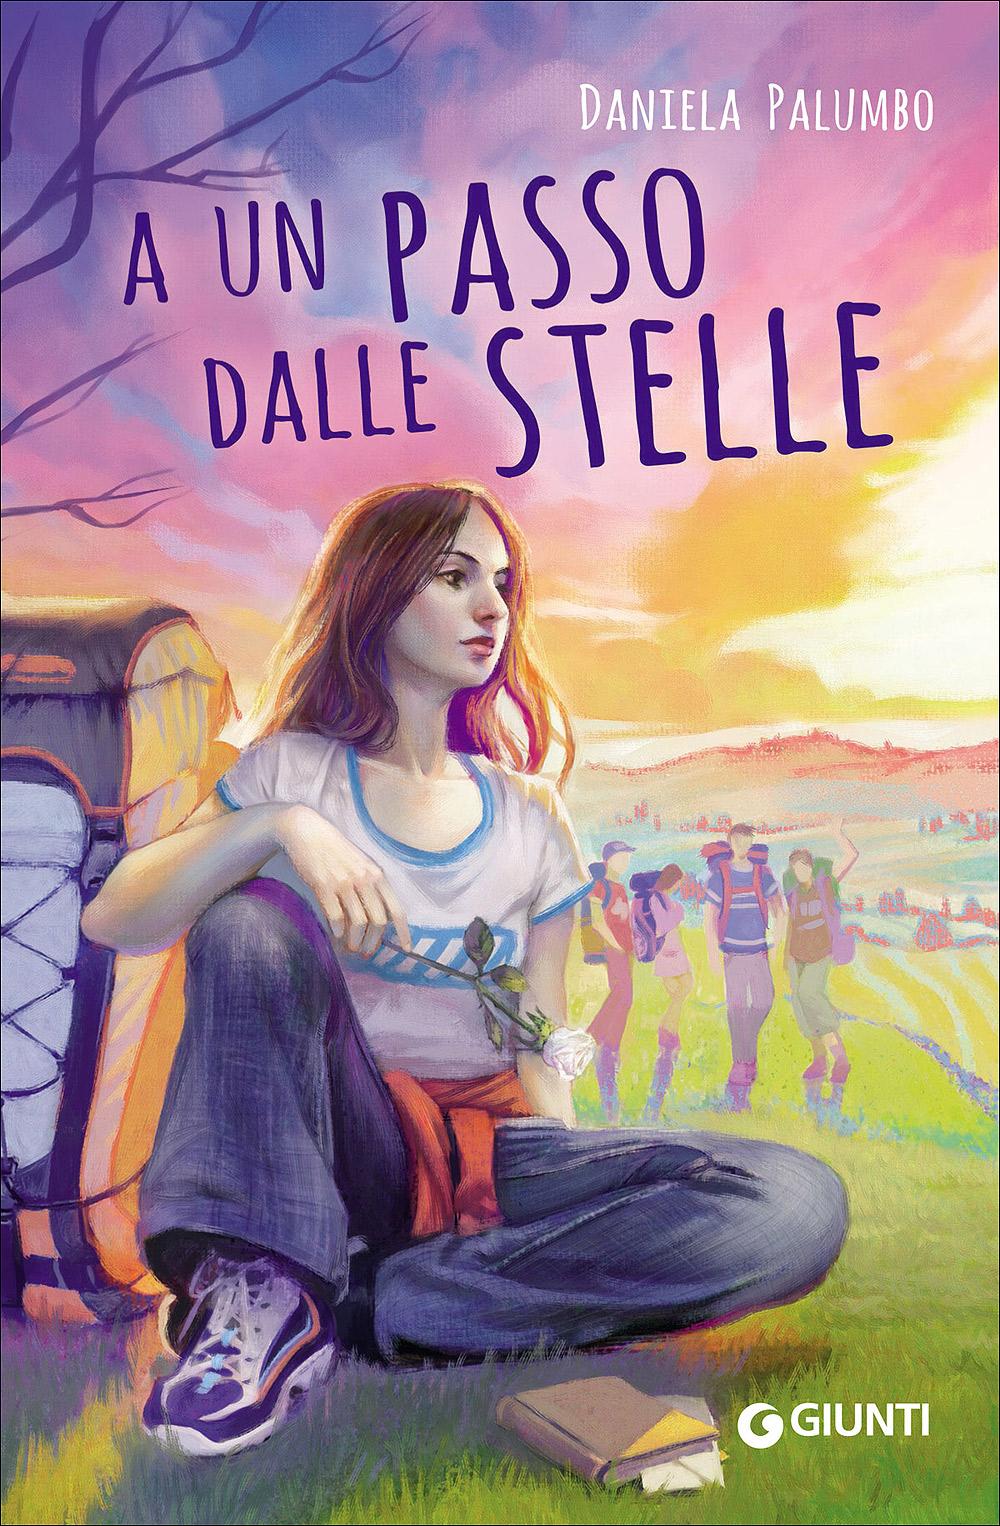 A un passo dalle stelle Daniela Palumbo